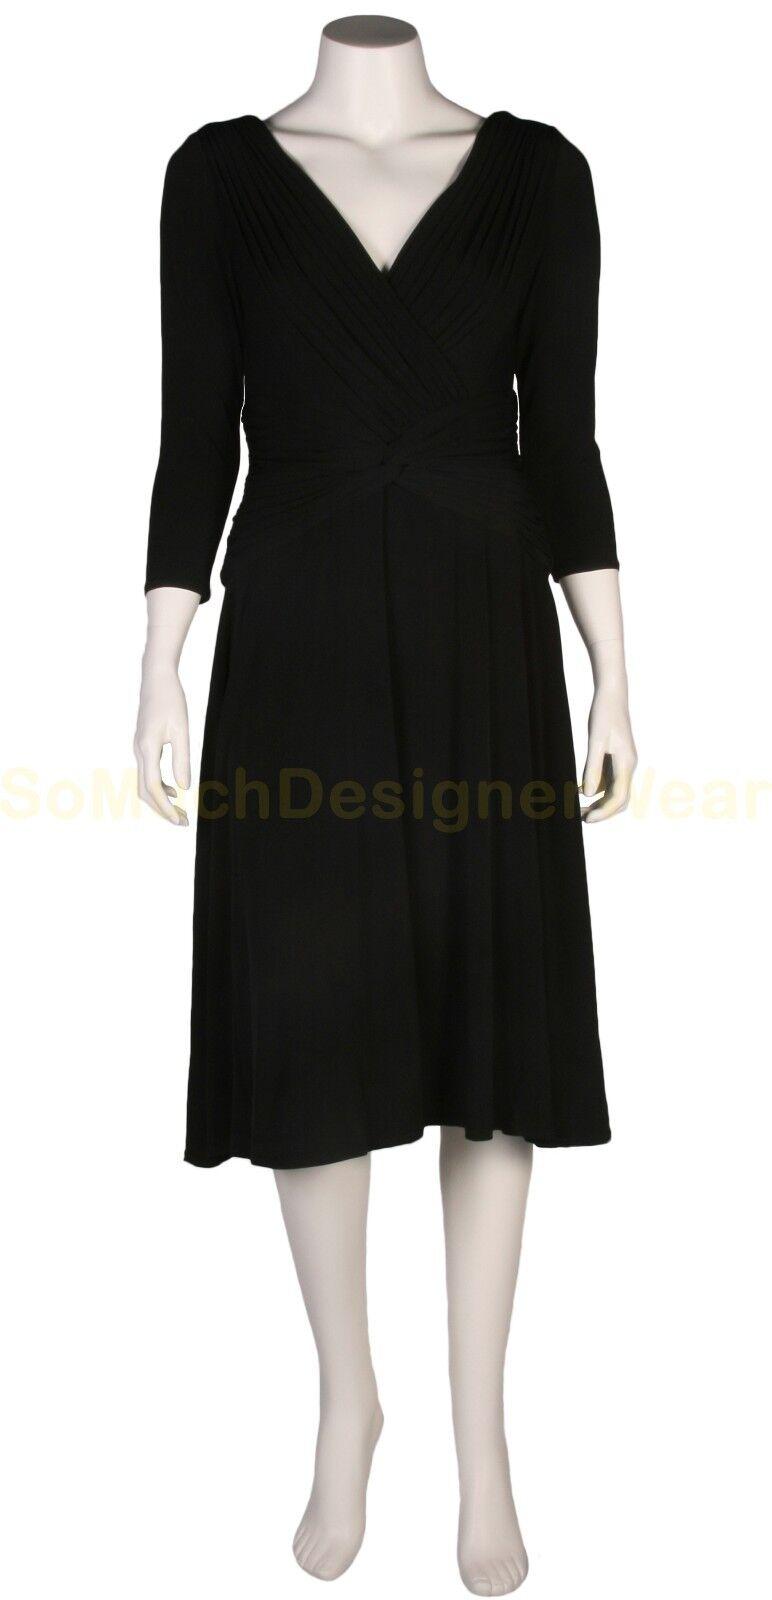 TADASHI jurk XS zwart NIEUW+LABELS ap €250